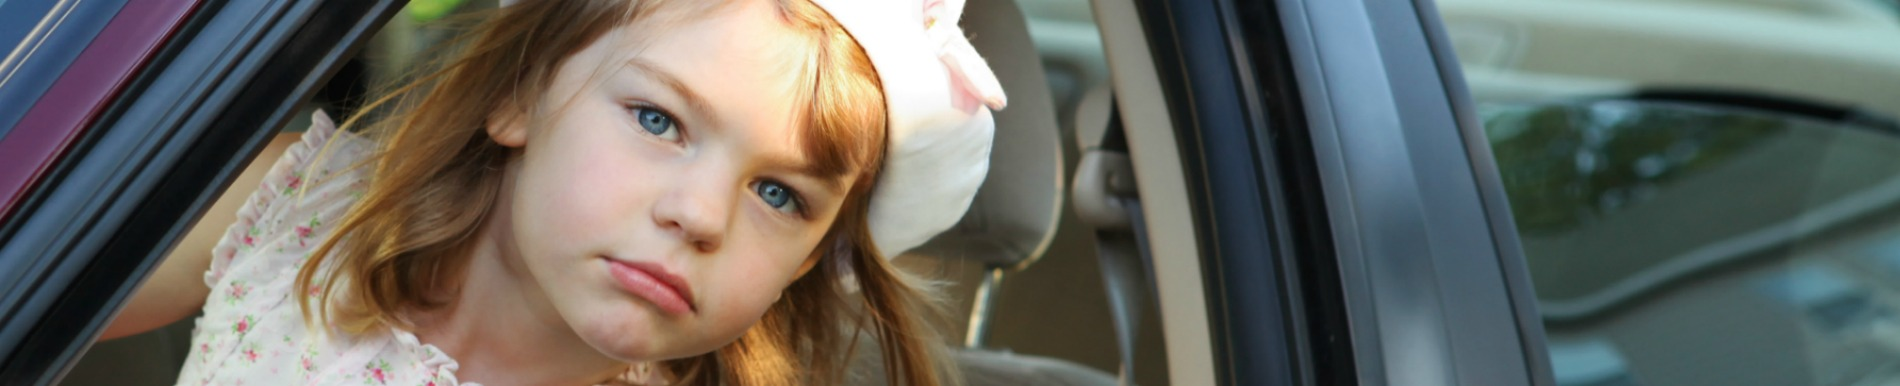 https://www.healthychildren.org/SiteCollectionImage-Homepage-Banners/prevent_hot_car_death_hc.jpg